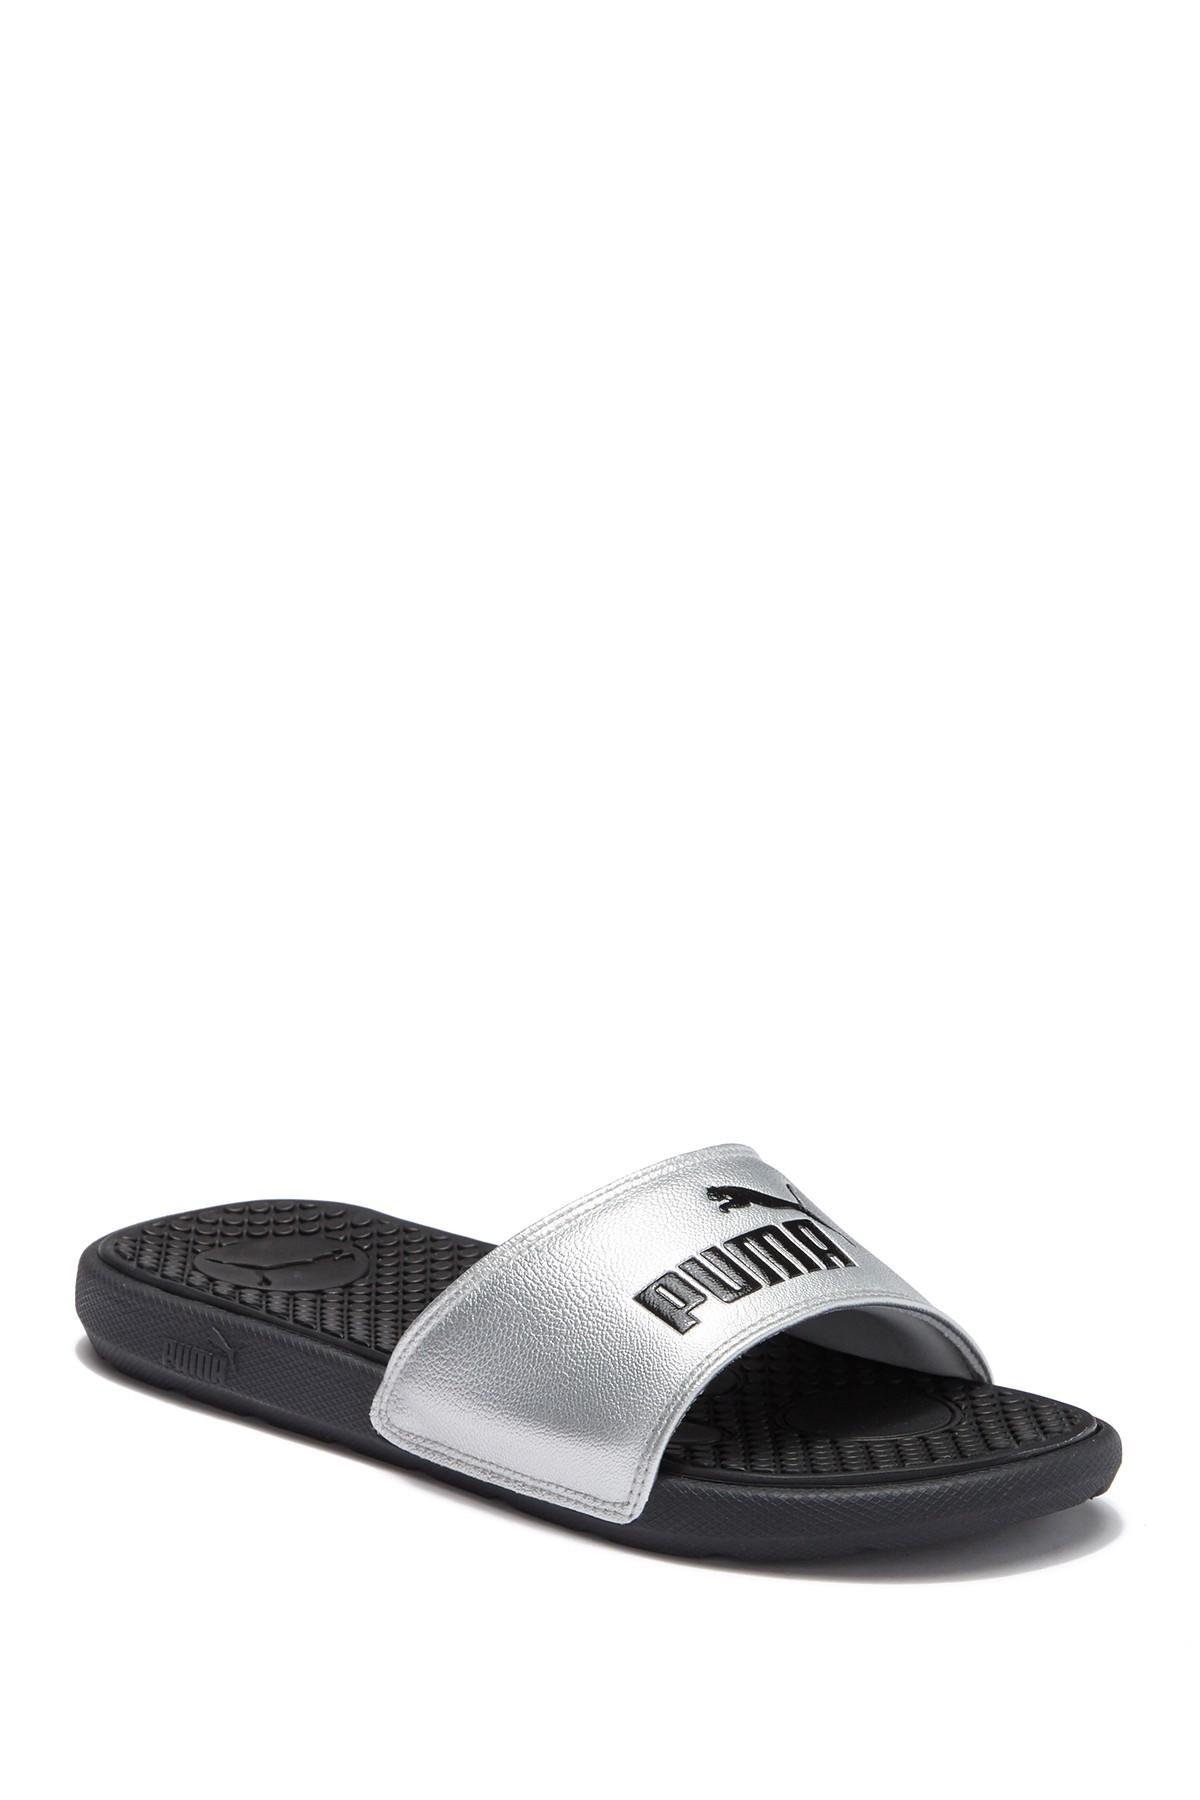 40f584f37 Lyst - PUMA Cool Cat Slide Sandal in Black